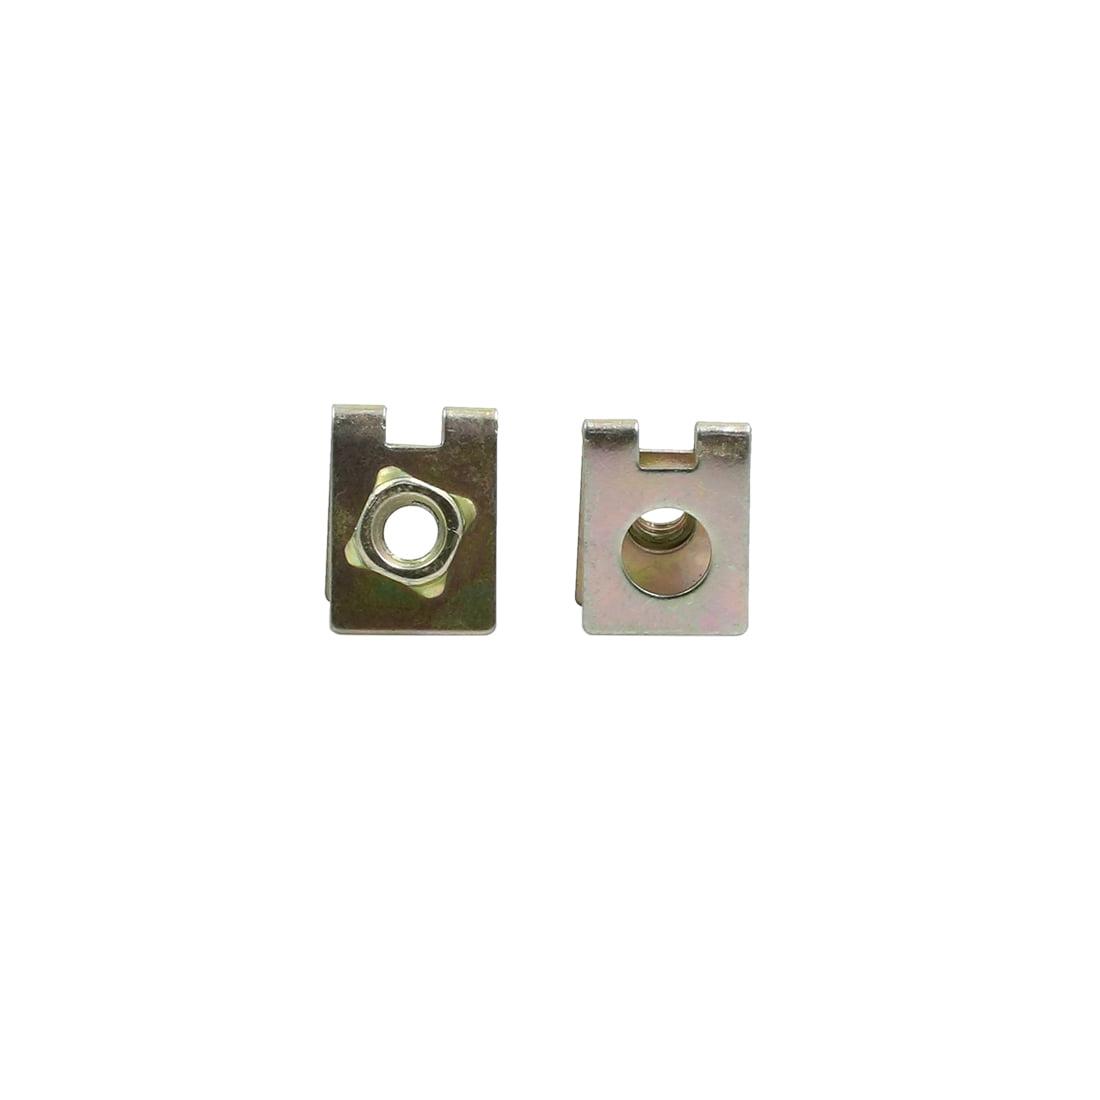 4pcs Spring Metal U-type Clip with Screw Car Fender Trim Panel Nuts Fasteners - image 1 of 4